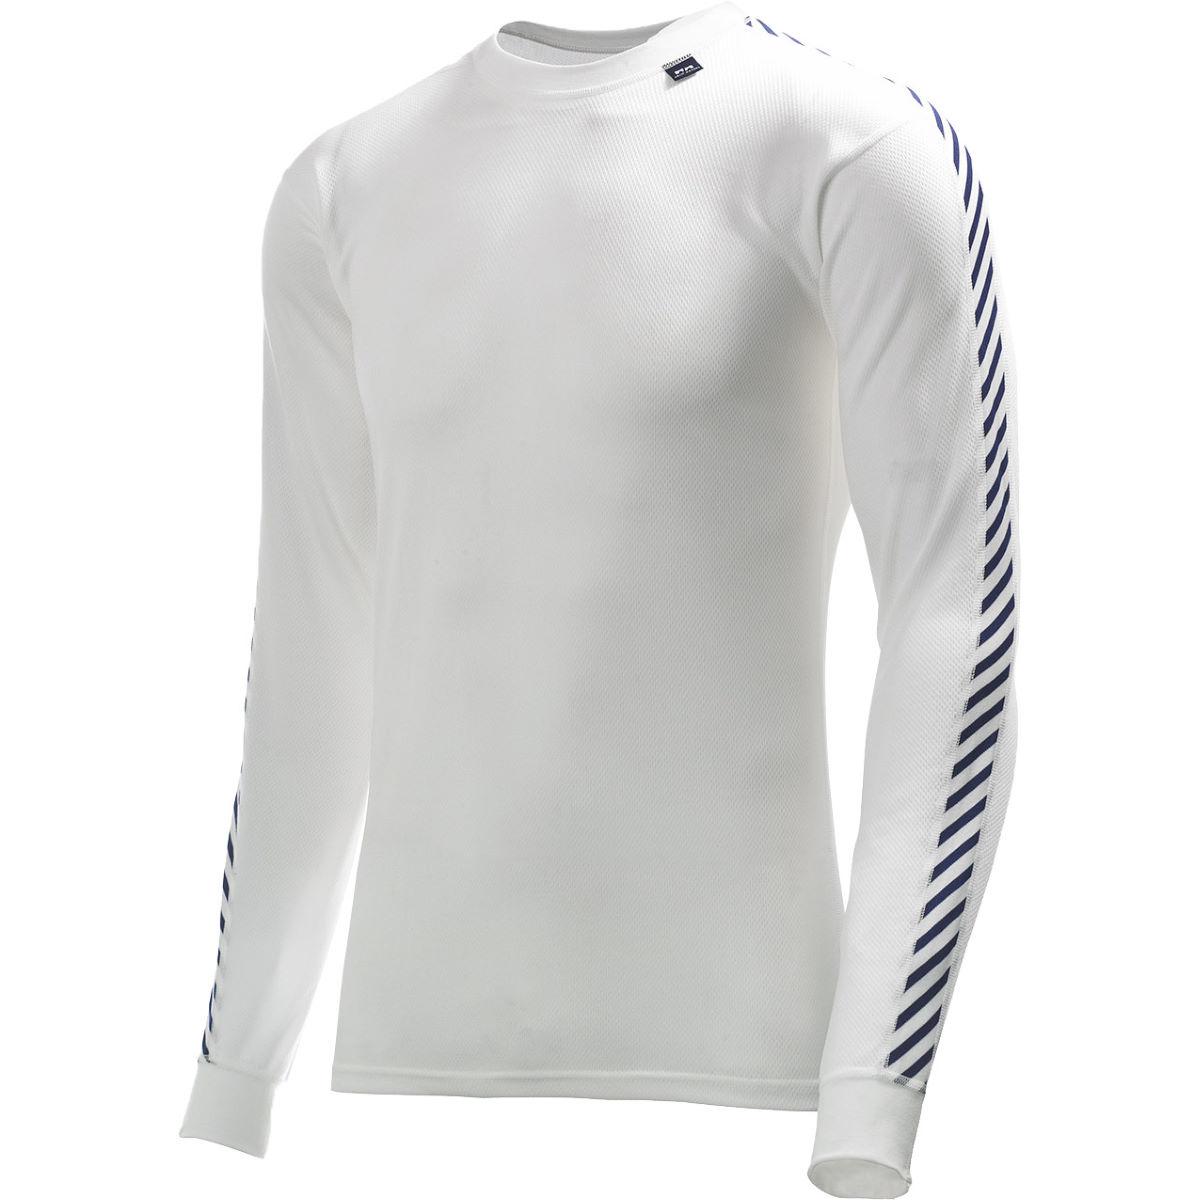 Camiseta interior de cuello redondo Helly Hansen Dry Stripe - Prendas interiores